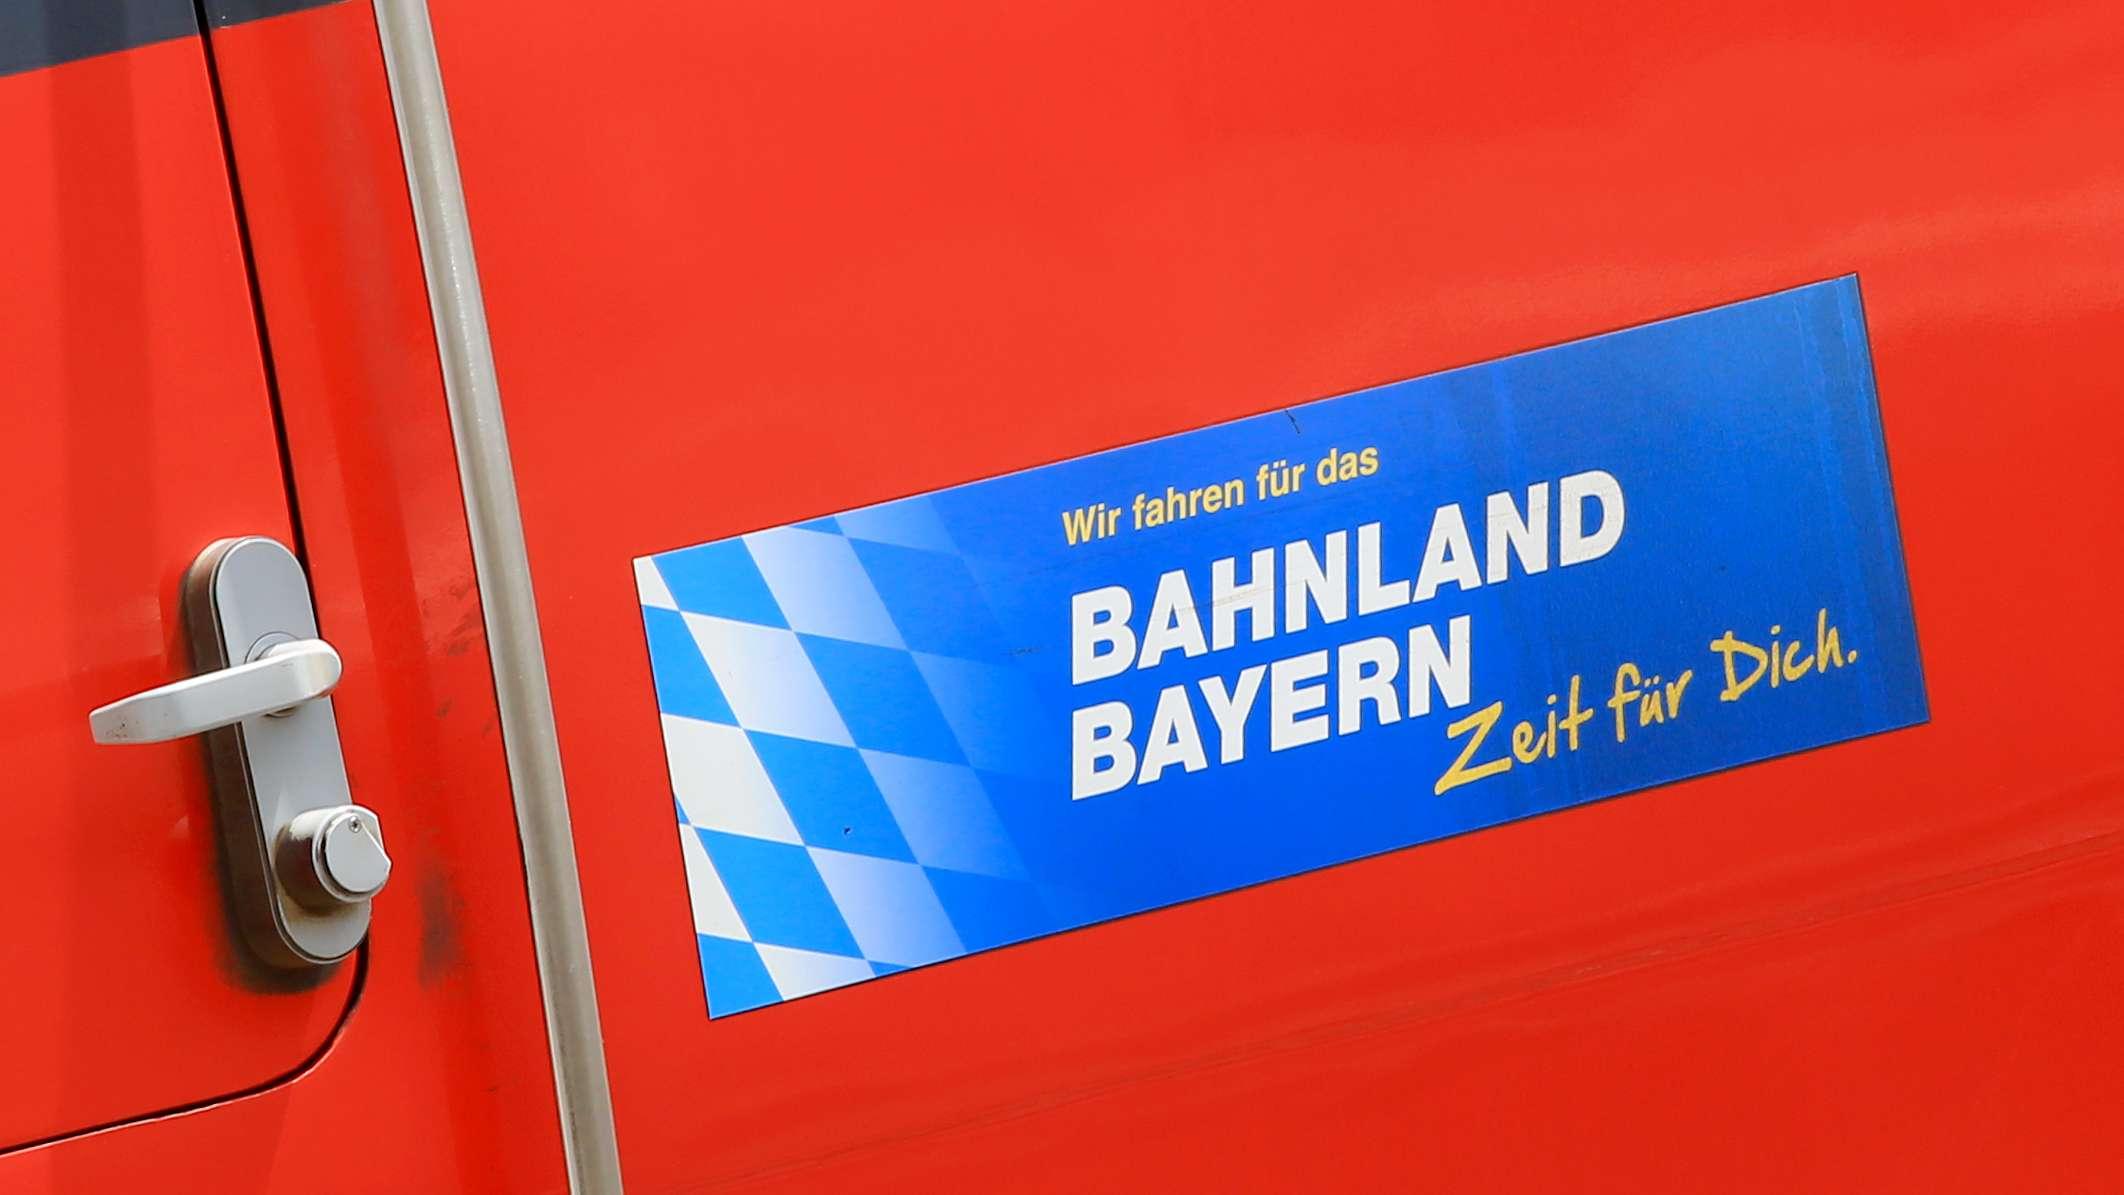 Bahnland Bayern (Symbolbild)